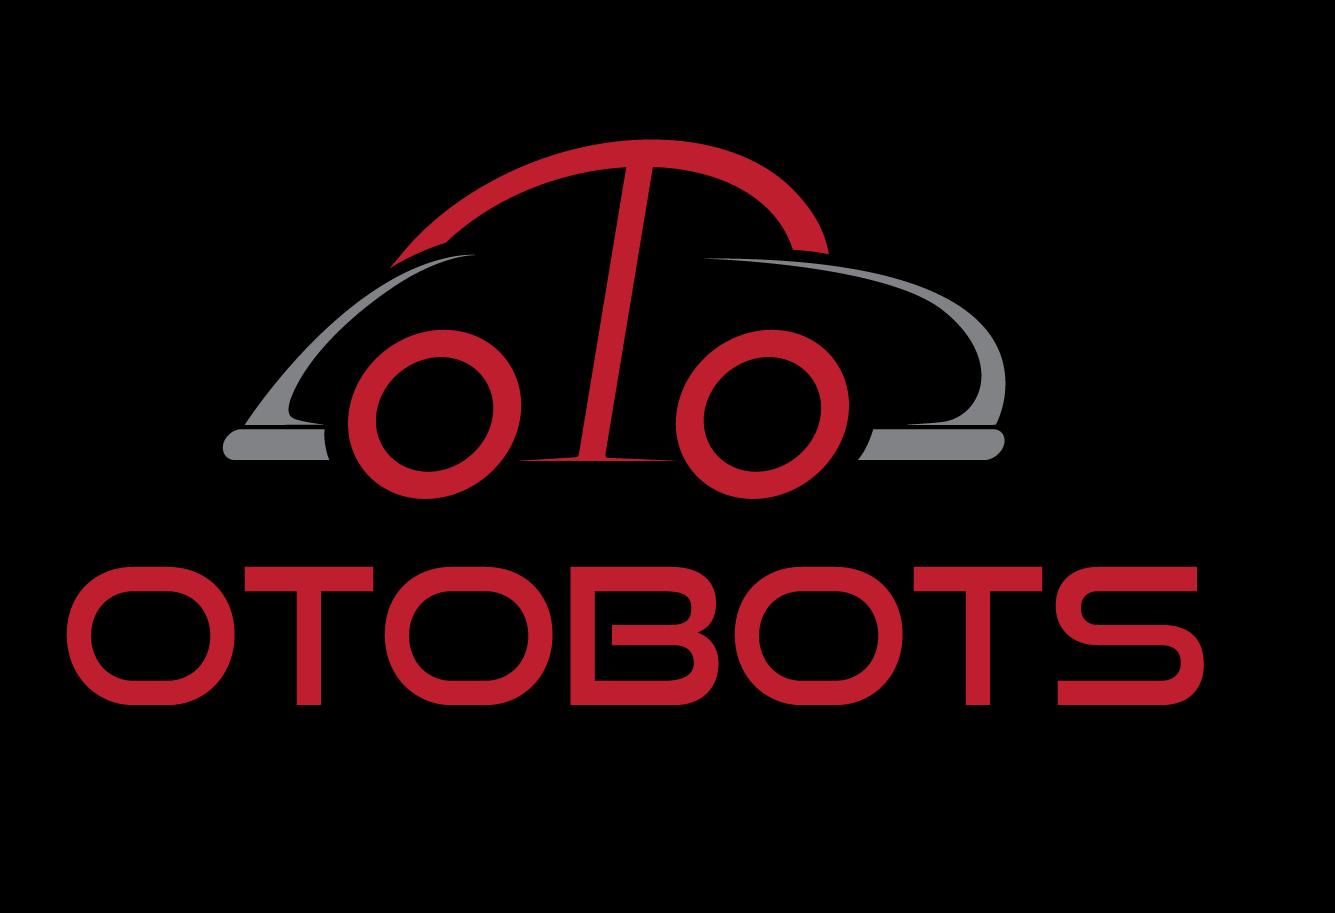 OTOBOTS Auto Repair Service provides Mobile Mechanic Service.